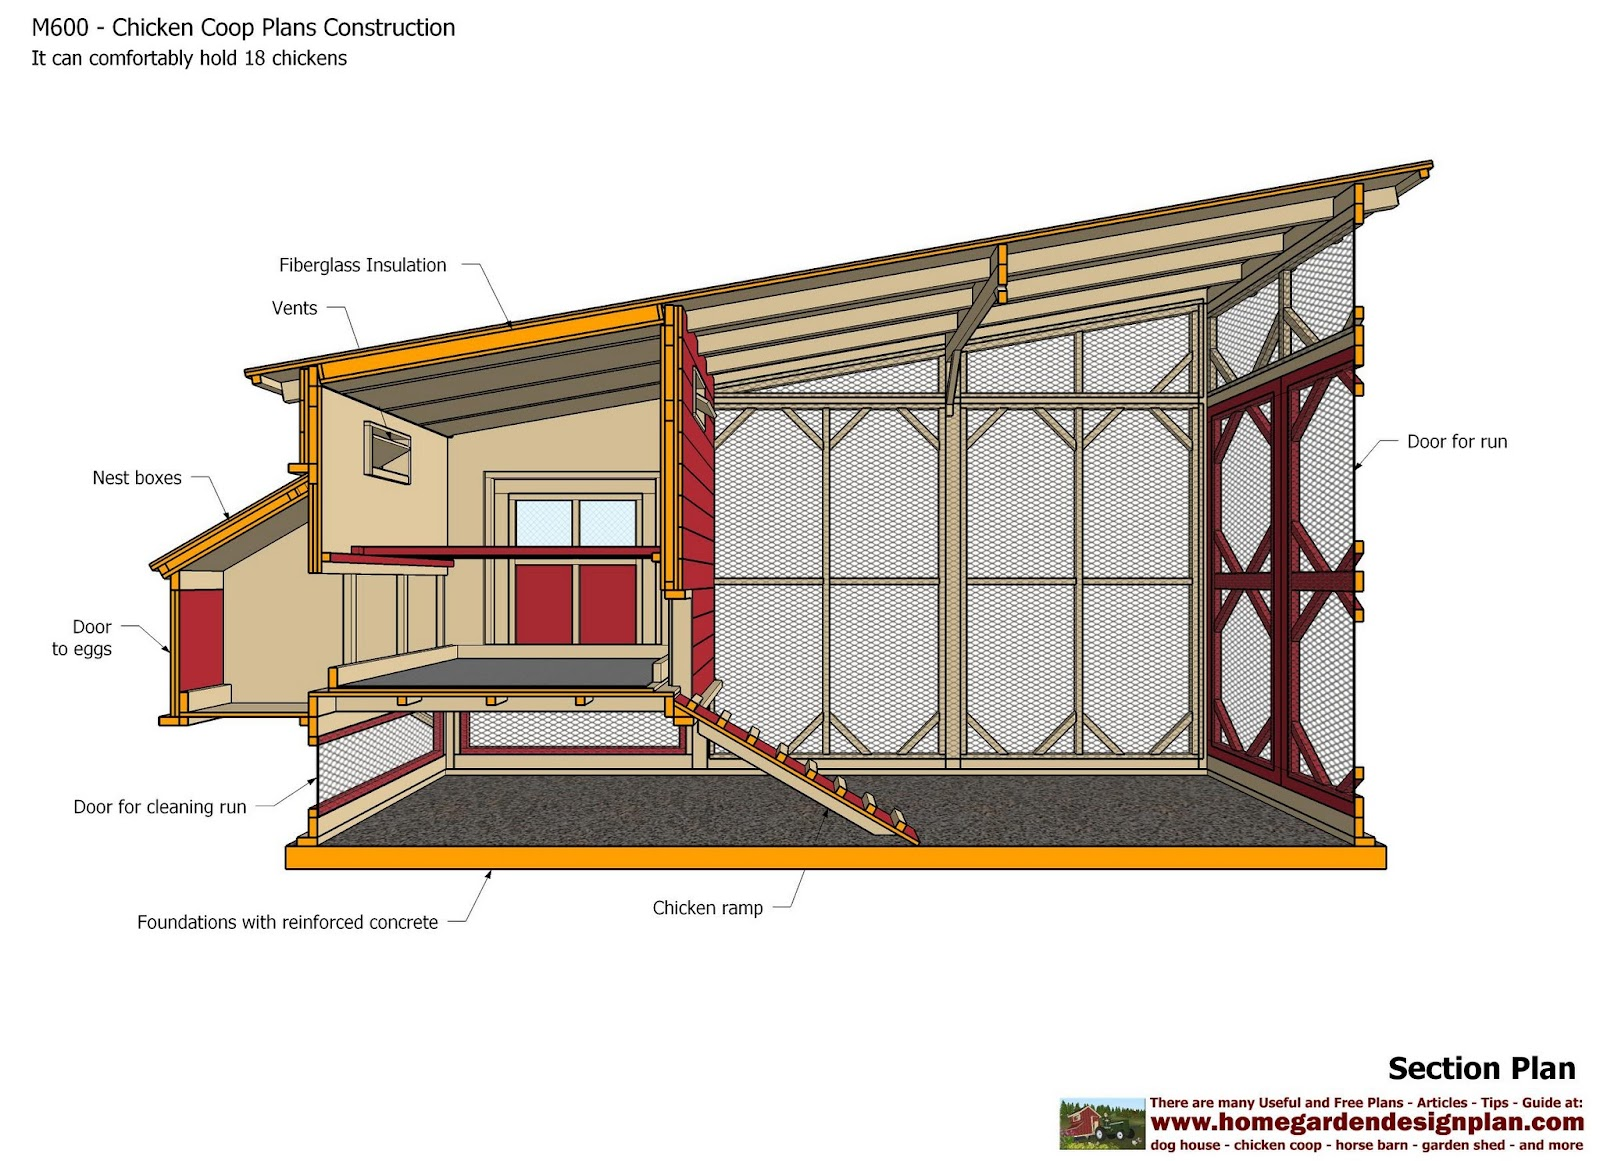 Chcken coop m600 chicken coop plans construction chicken Contractor house plans